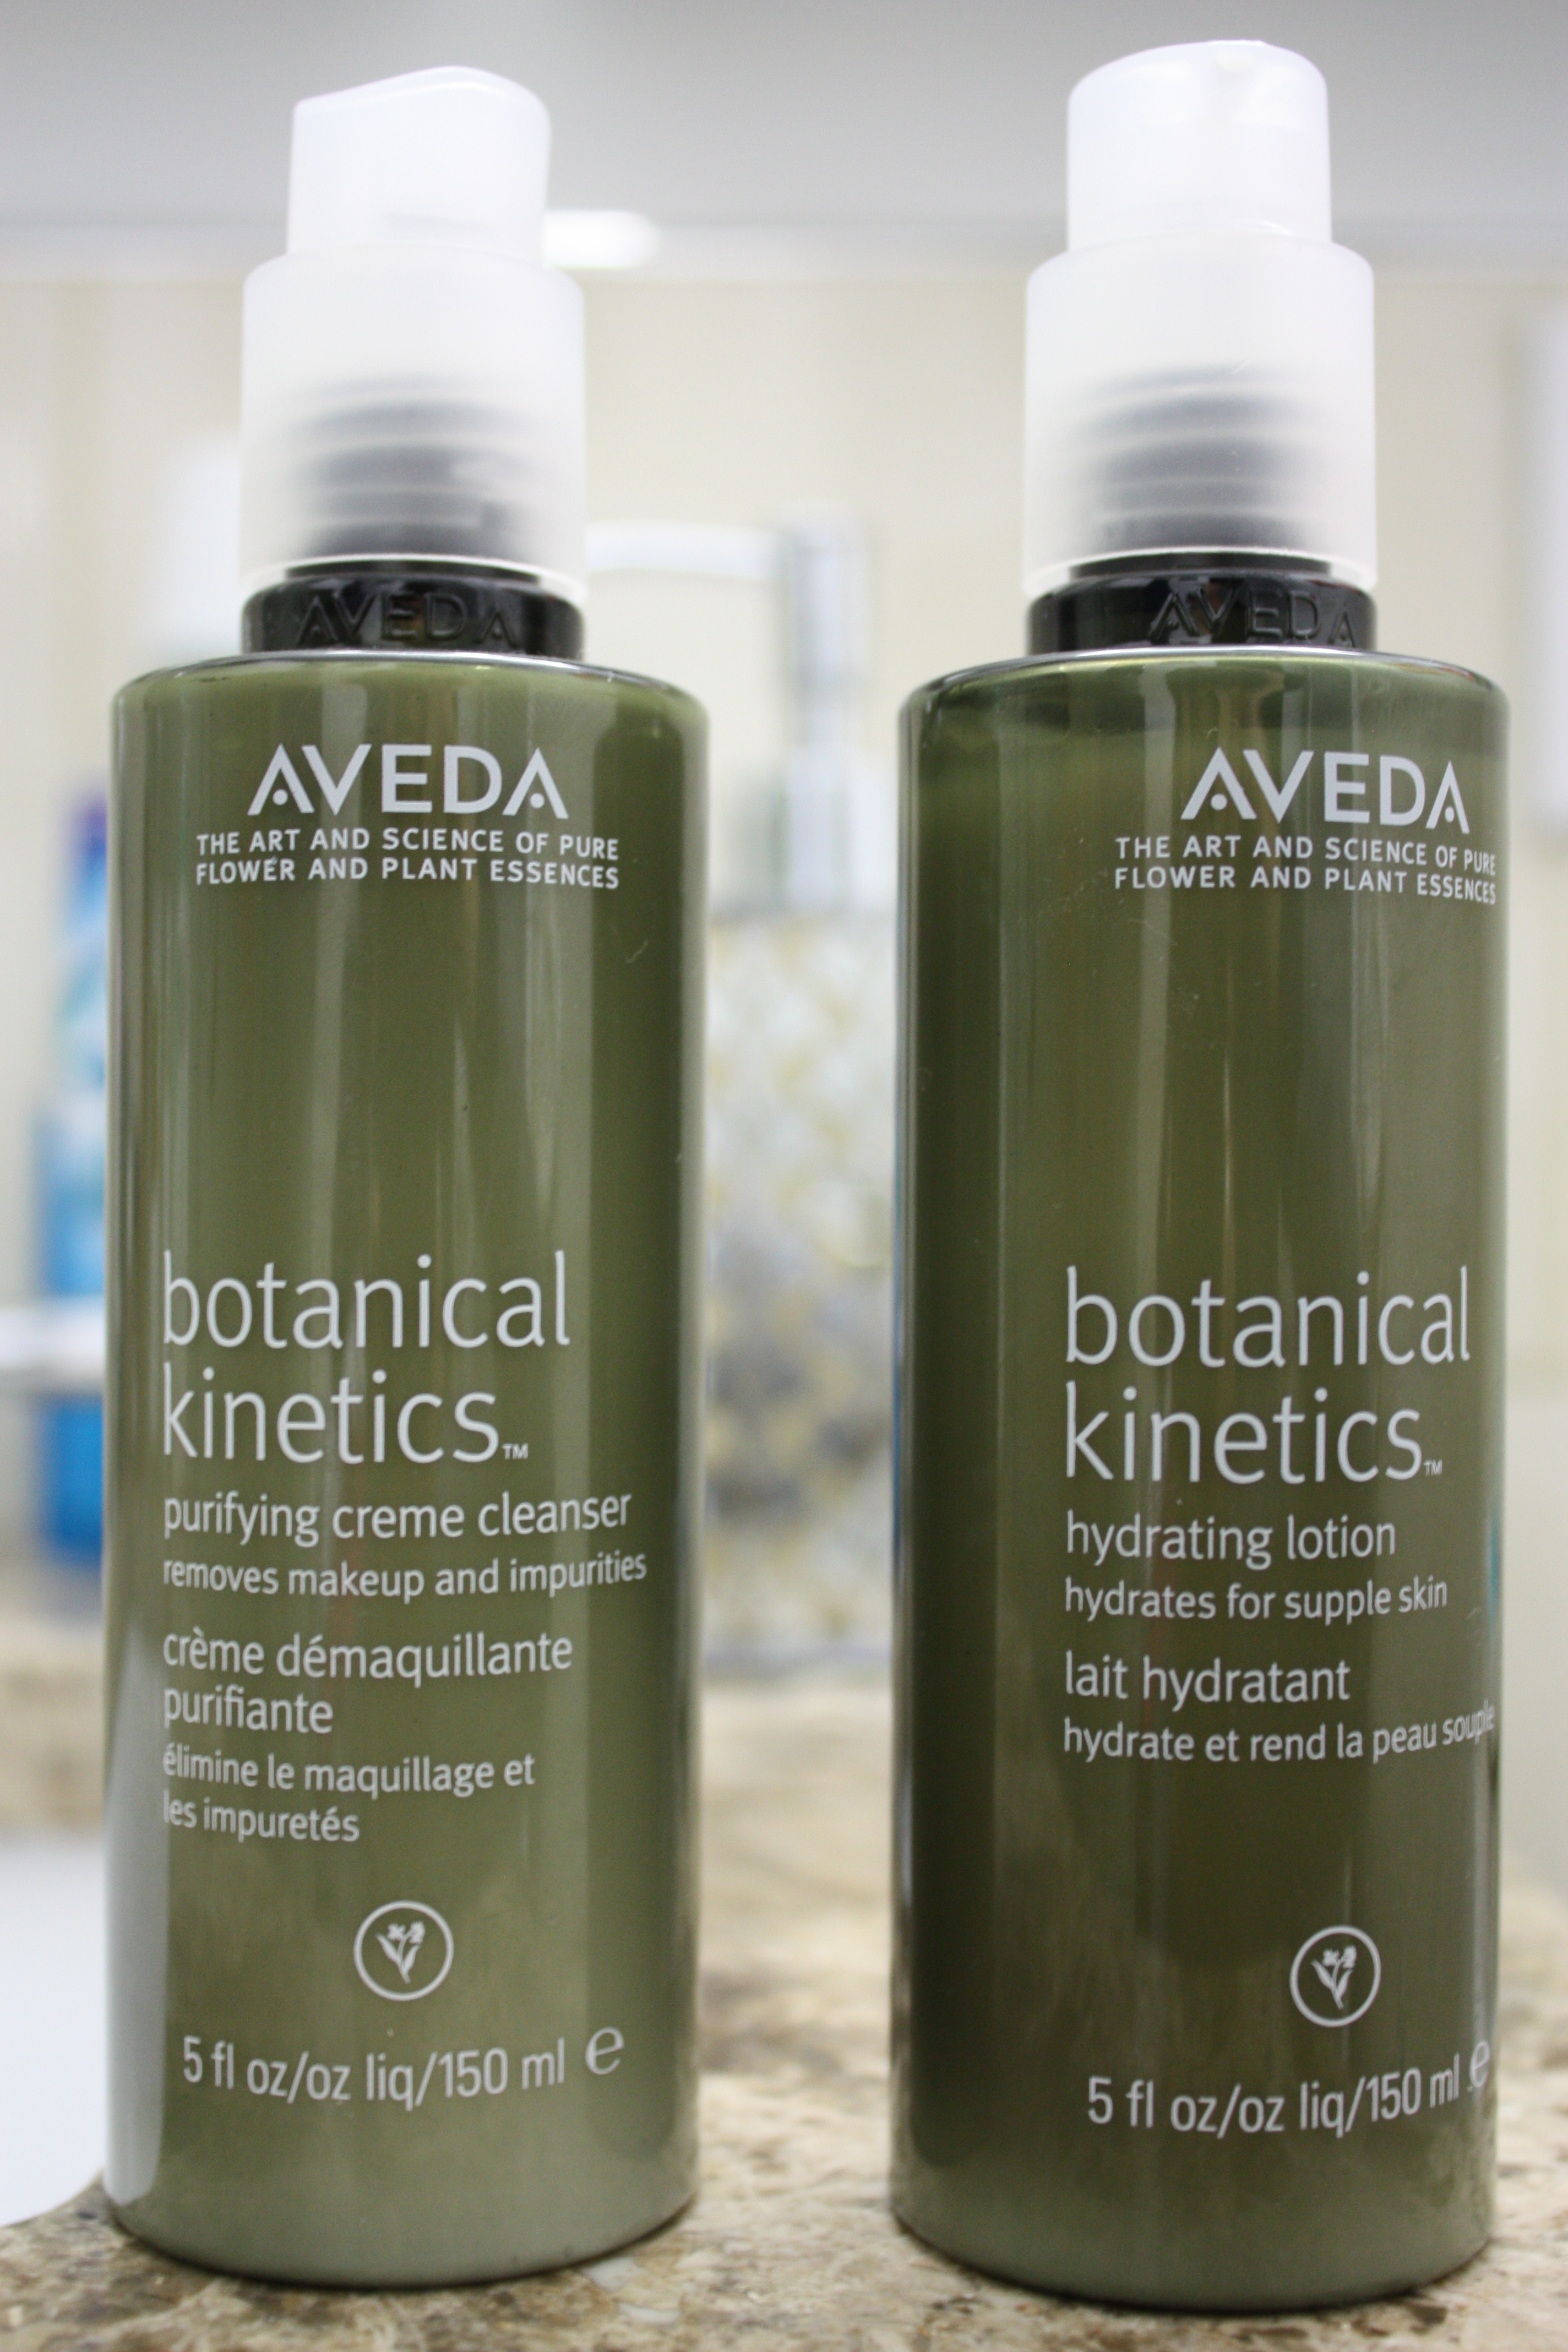 aveda purifying creme cleanser 16.9 oz Revitalizing Supreme Global Anti-Aging Creme 1oz